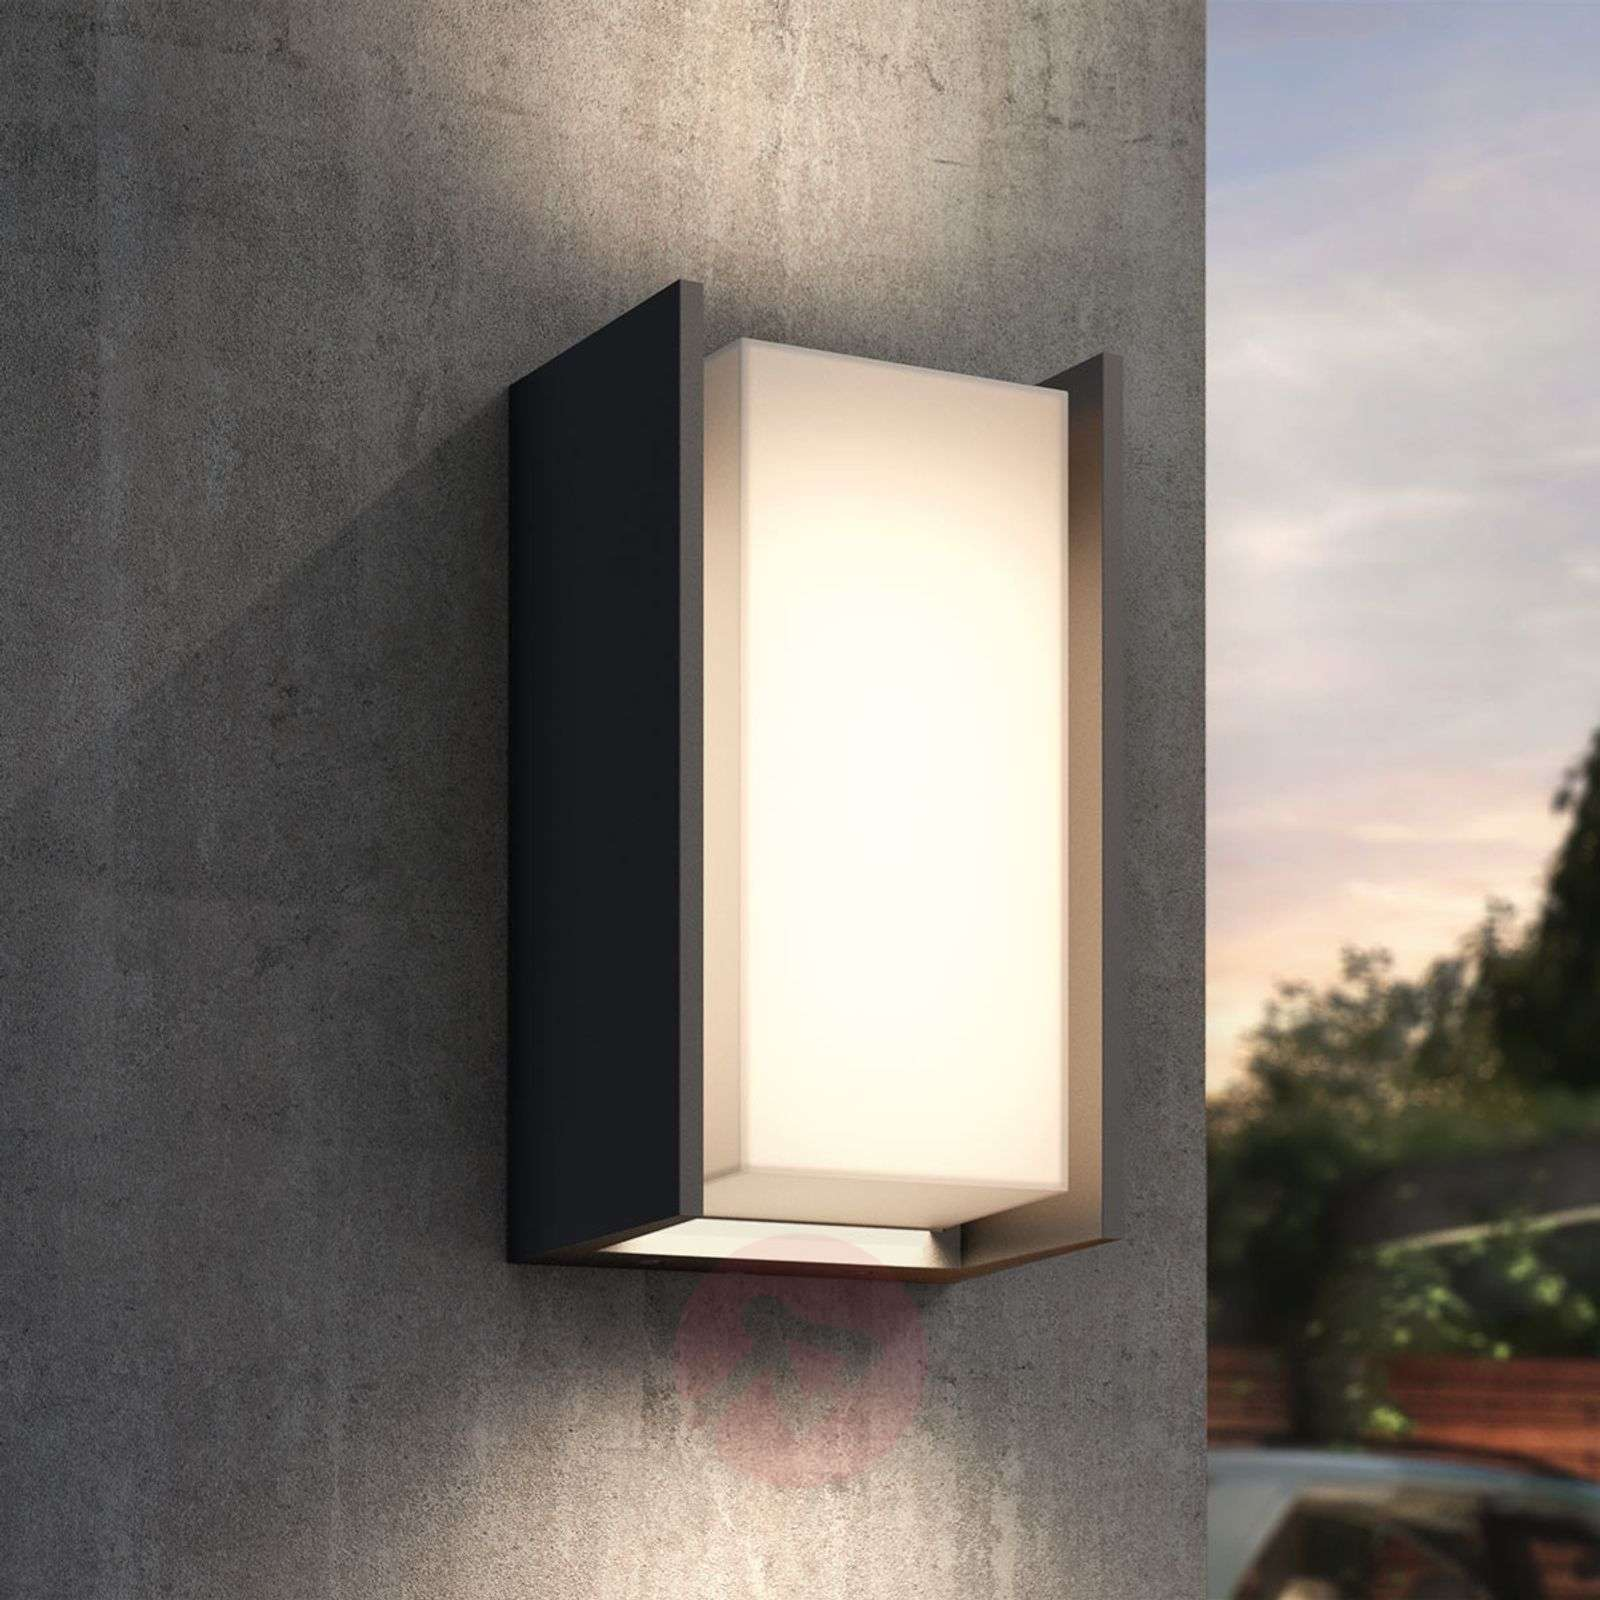 Philips Hue Turaco Led Outdoor Wall Light Lights Ie